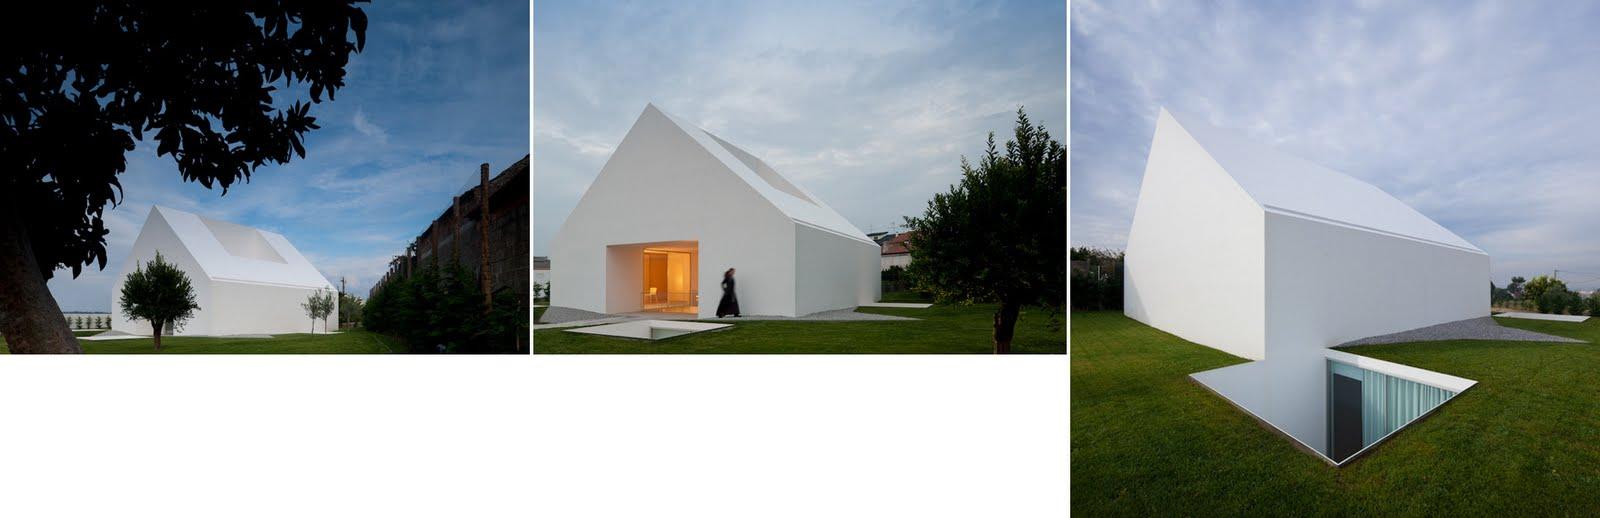 Peachvelvet aires mateus house in leiria for House in leiria aires mateus